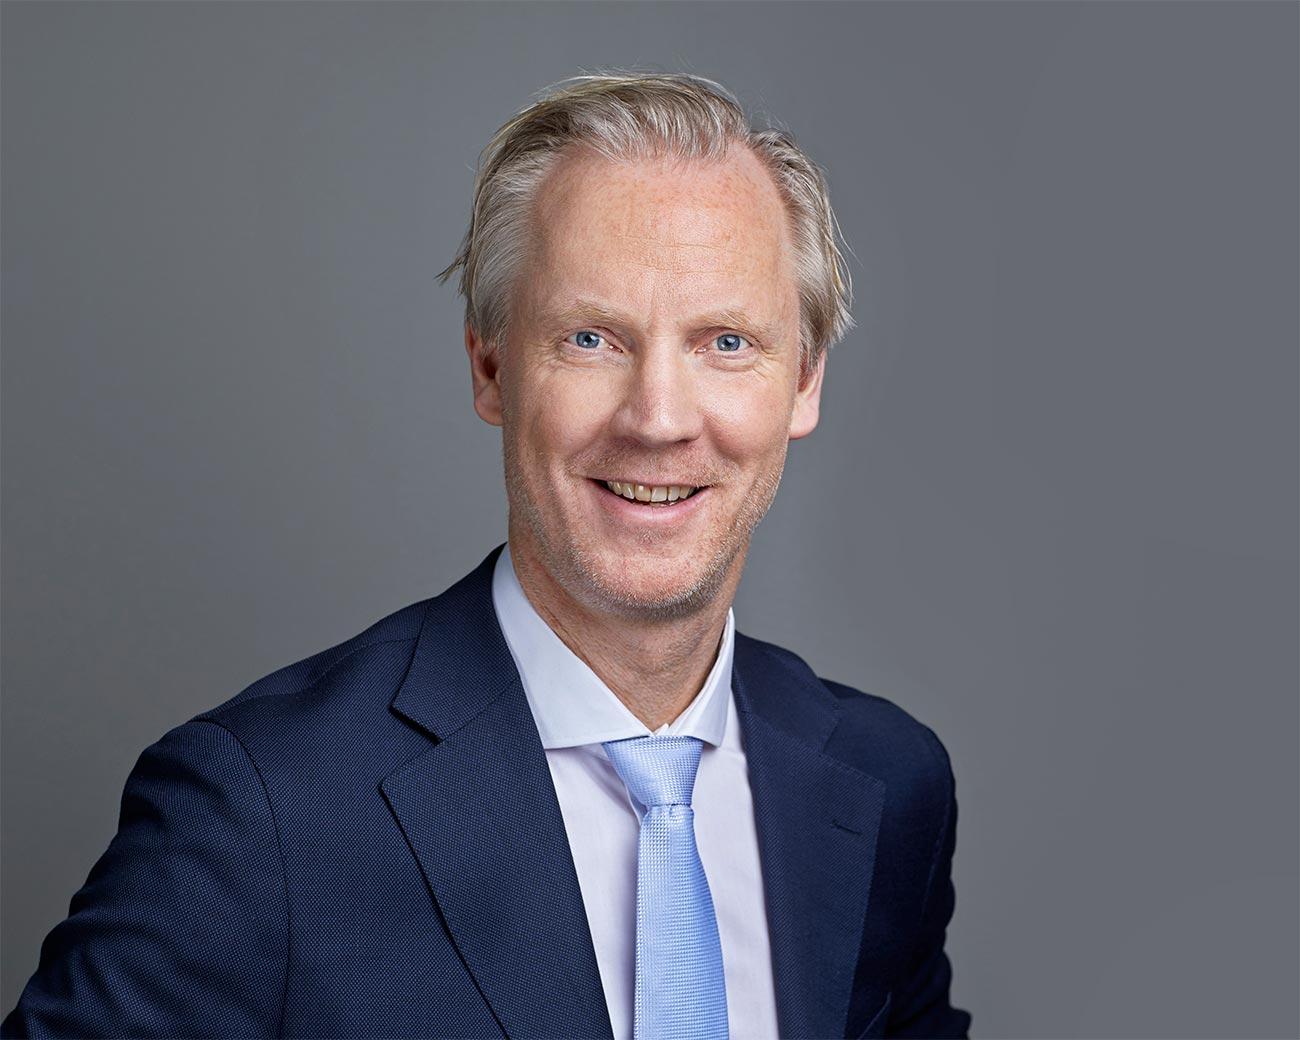 Nikolai Utheim, CEO of Coor in Norway